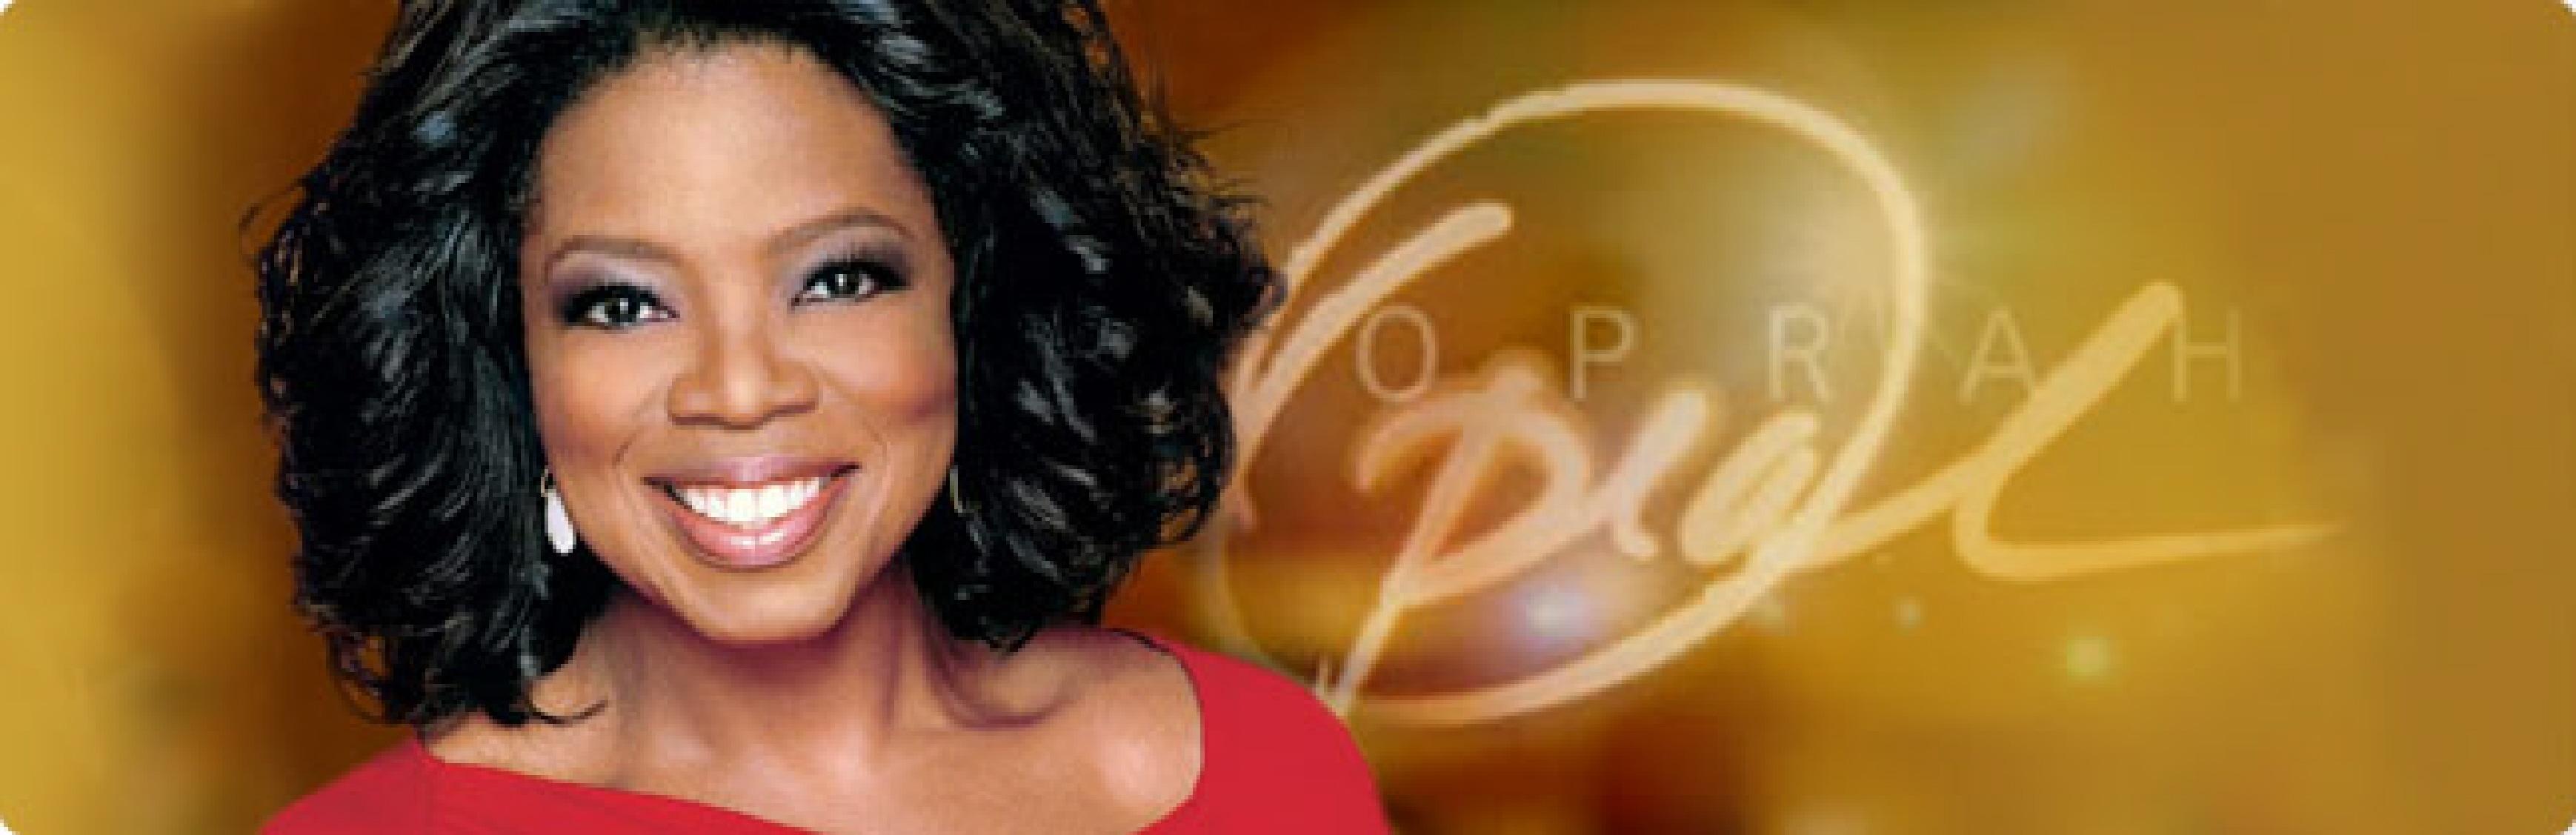 Oprah Winfrey Reveals How She And Stedman Graham Have Made Their Spiritual Partnership Work